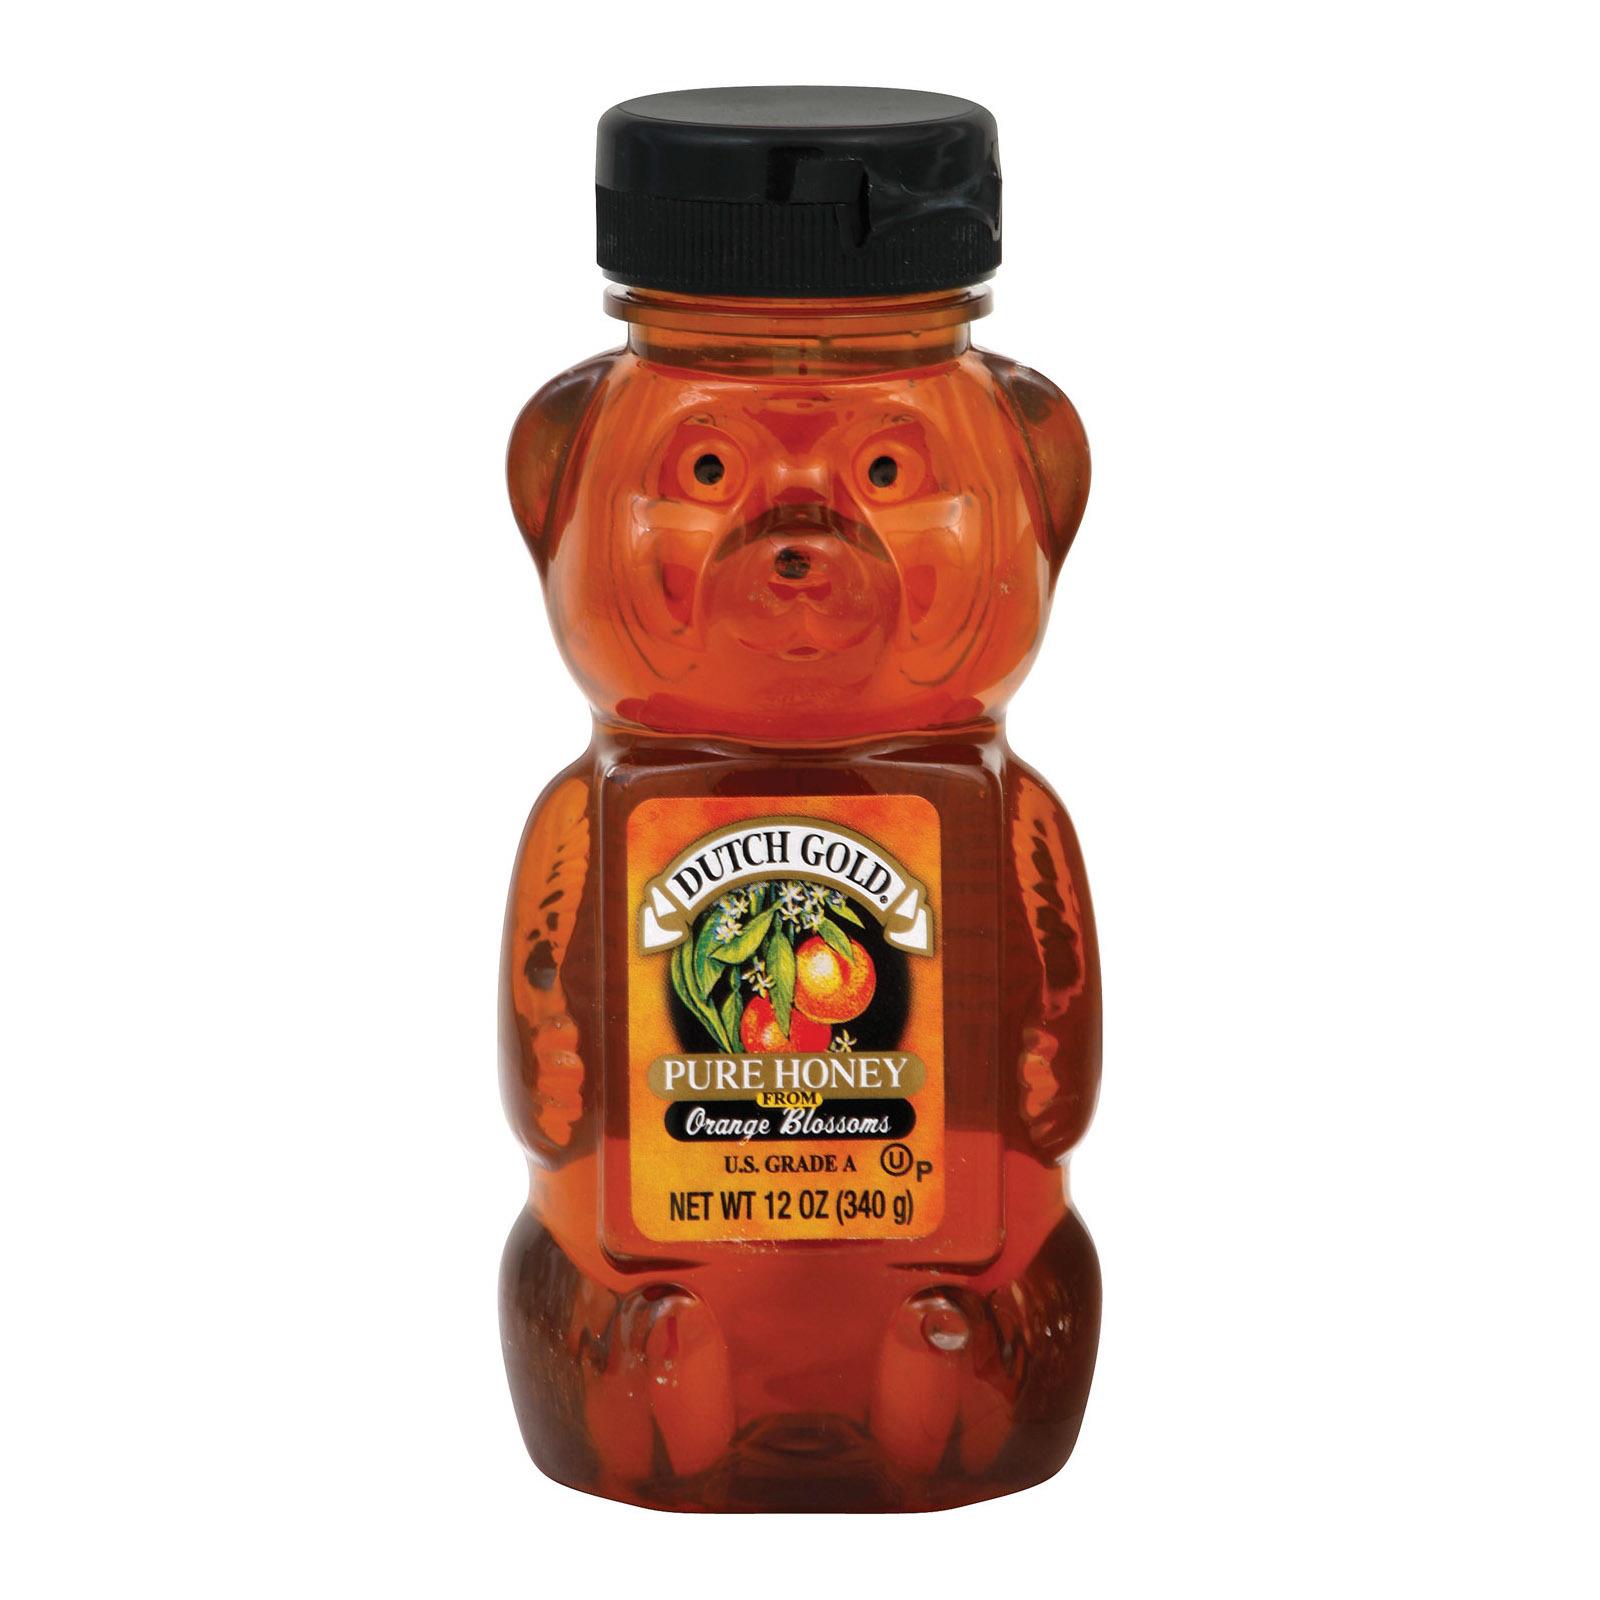 Dutch Gold Honey Orange Blossom Honey - 12 oz.